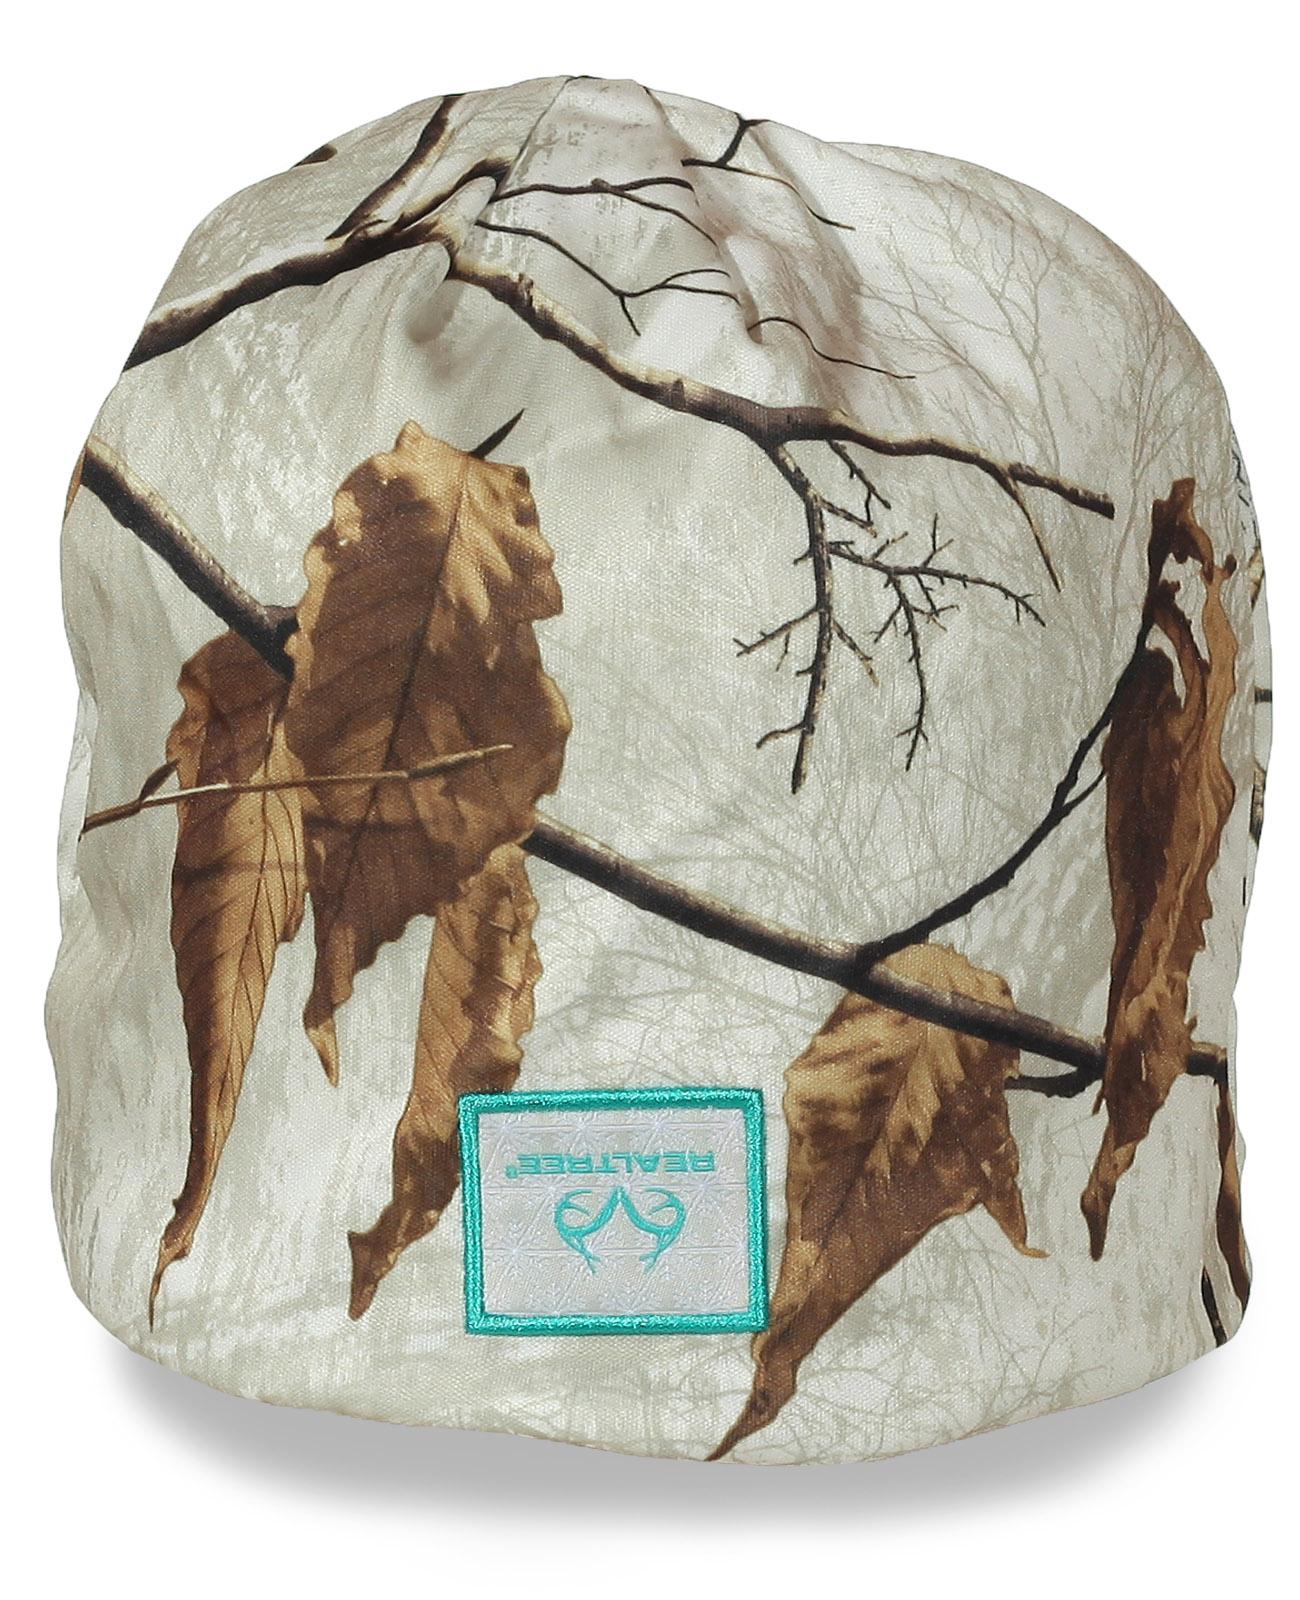 Мужская шапка Realtree. Светлый защитный цвет